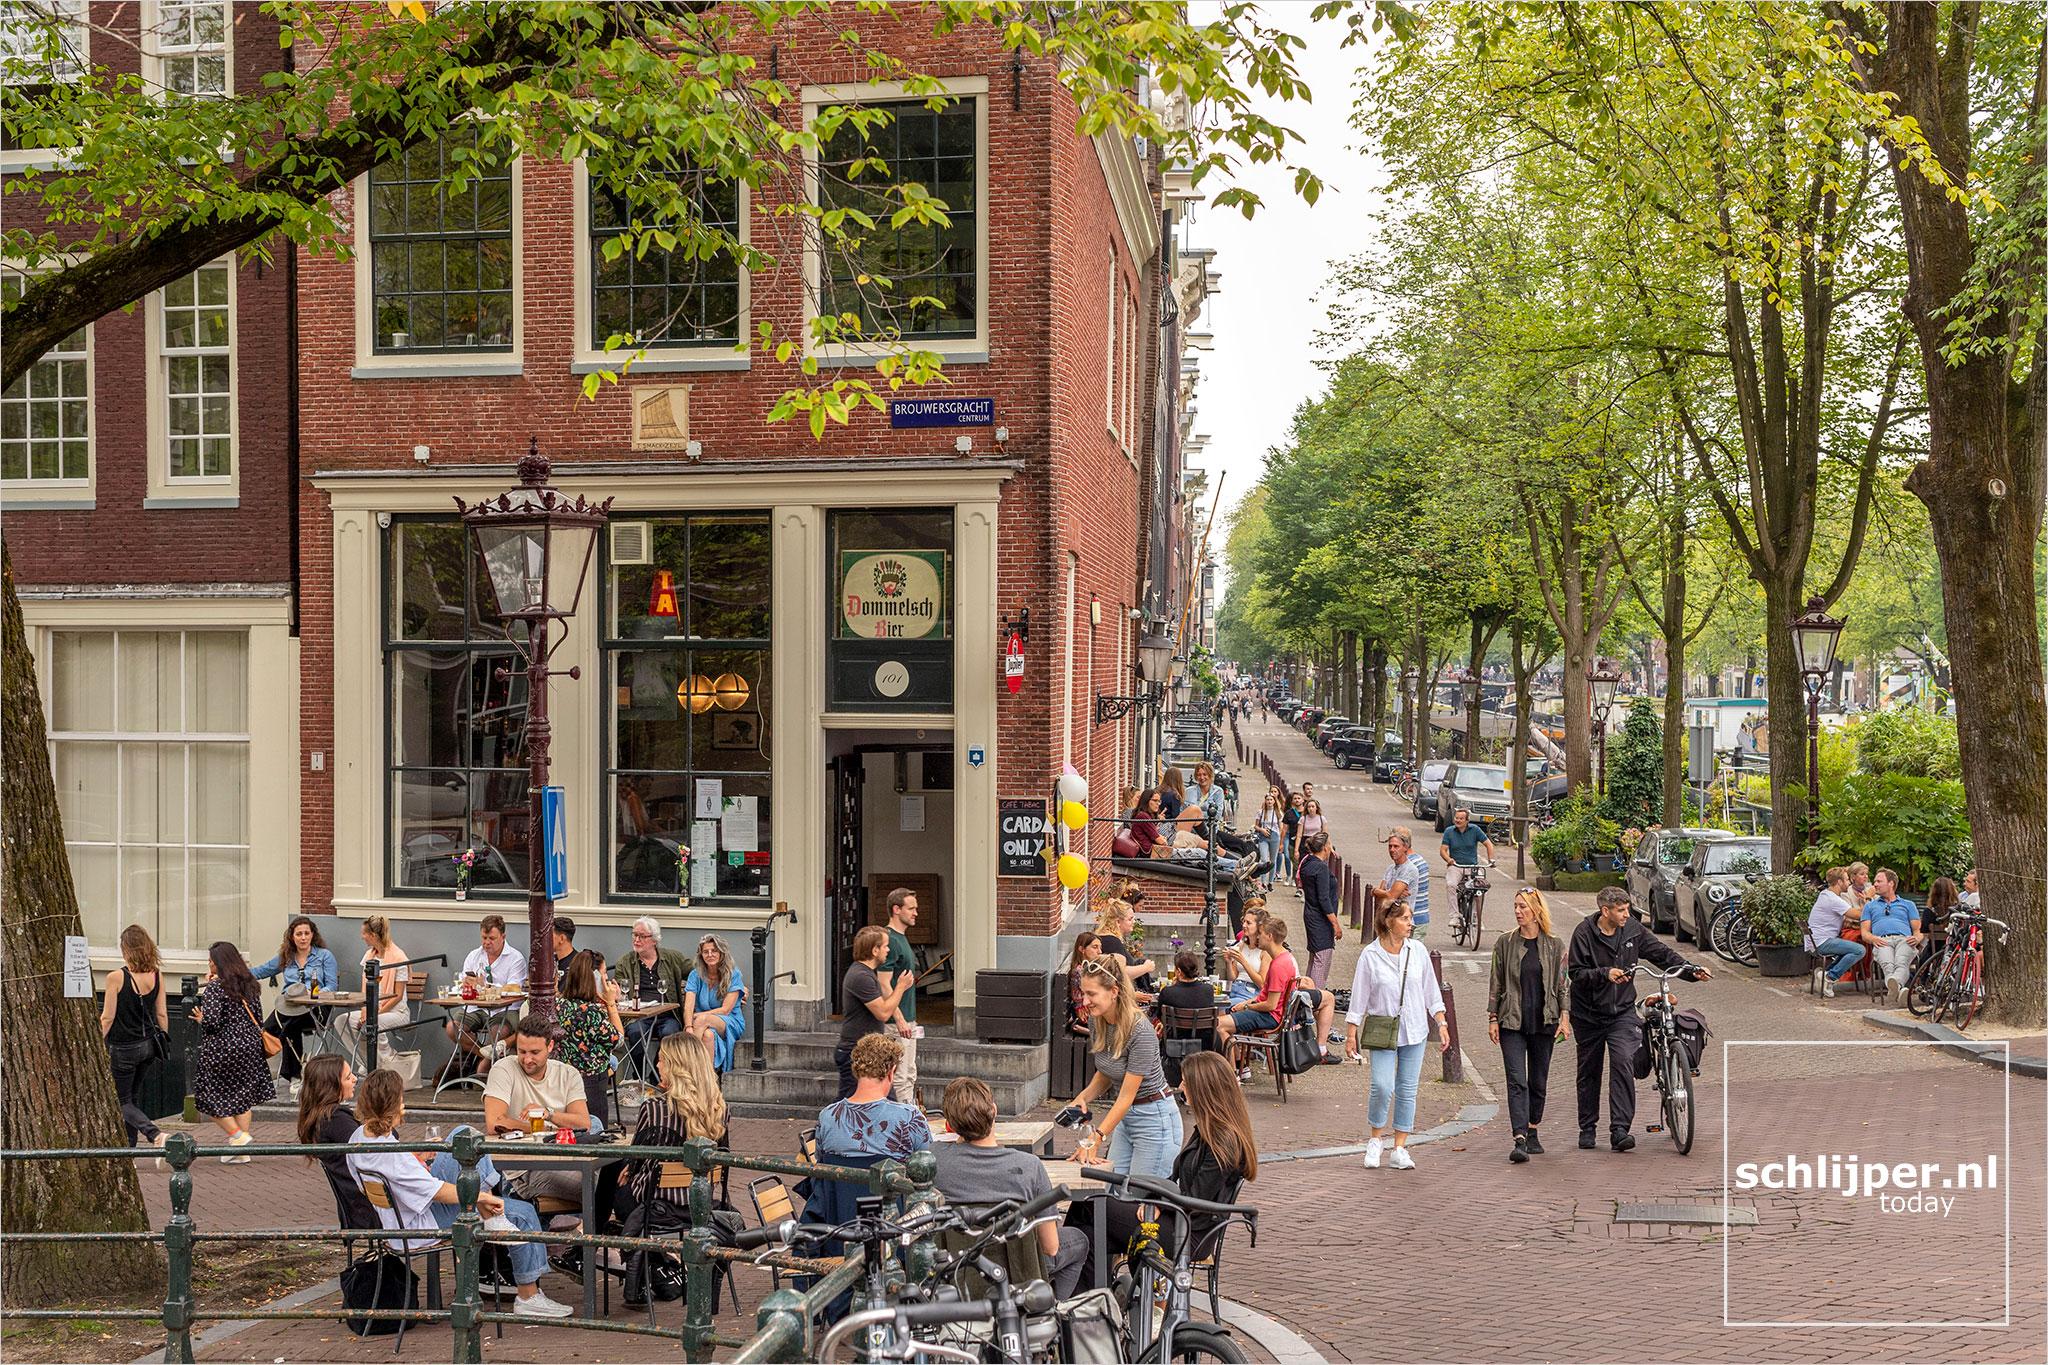 The Netherlands, Amsterdam, 21 augustus 2021